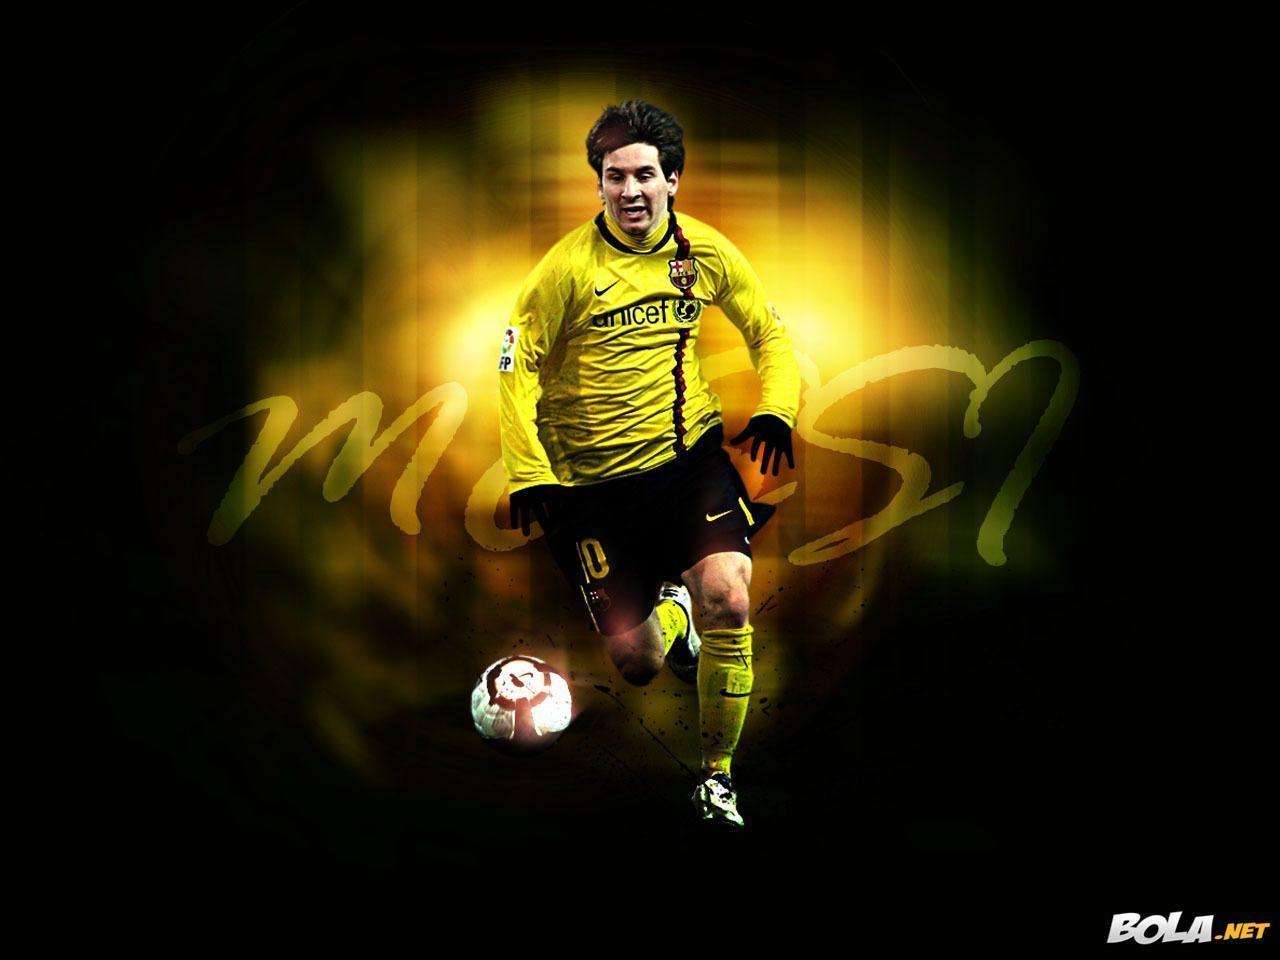 Lionel Messi HD Wallpaper 2014 (yellow) - Football Wallpaper HD ...